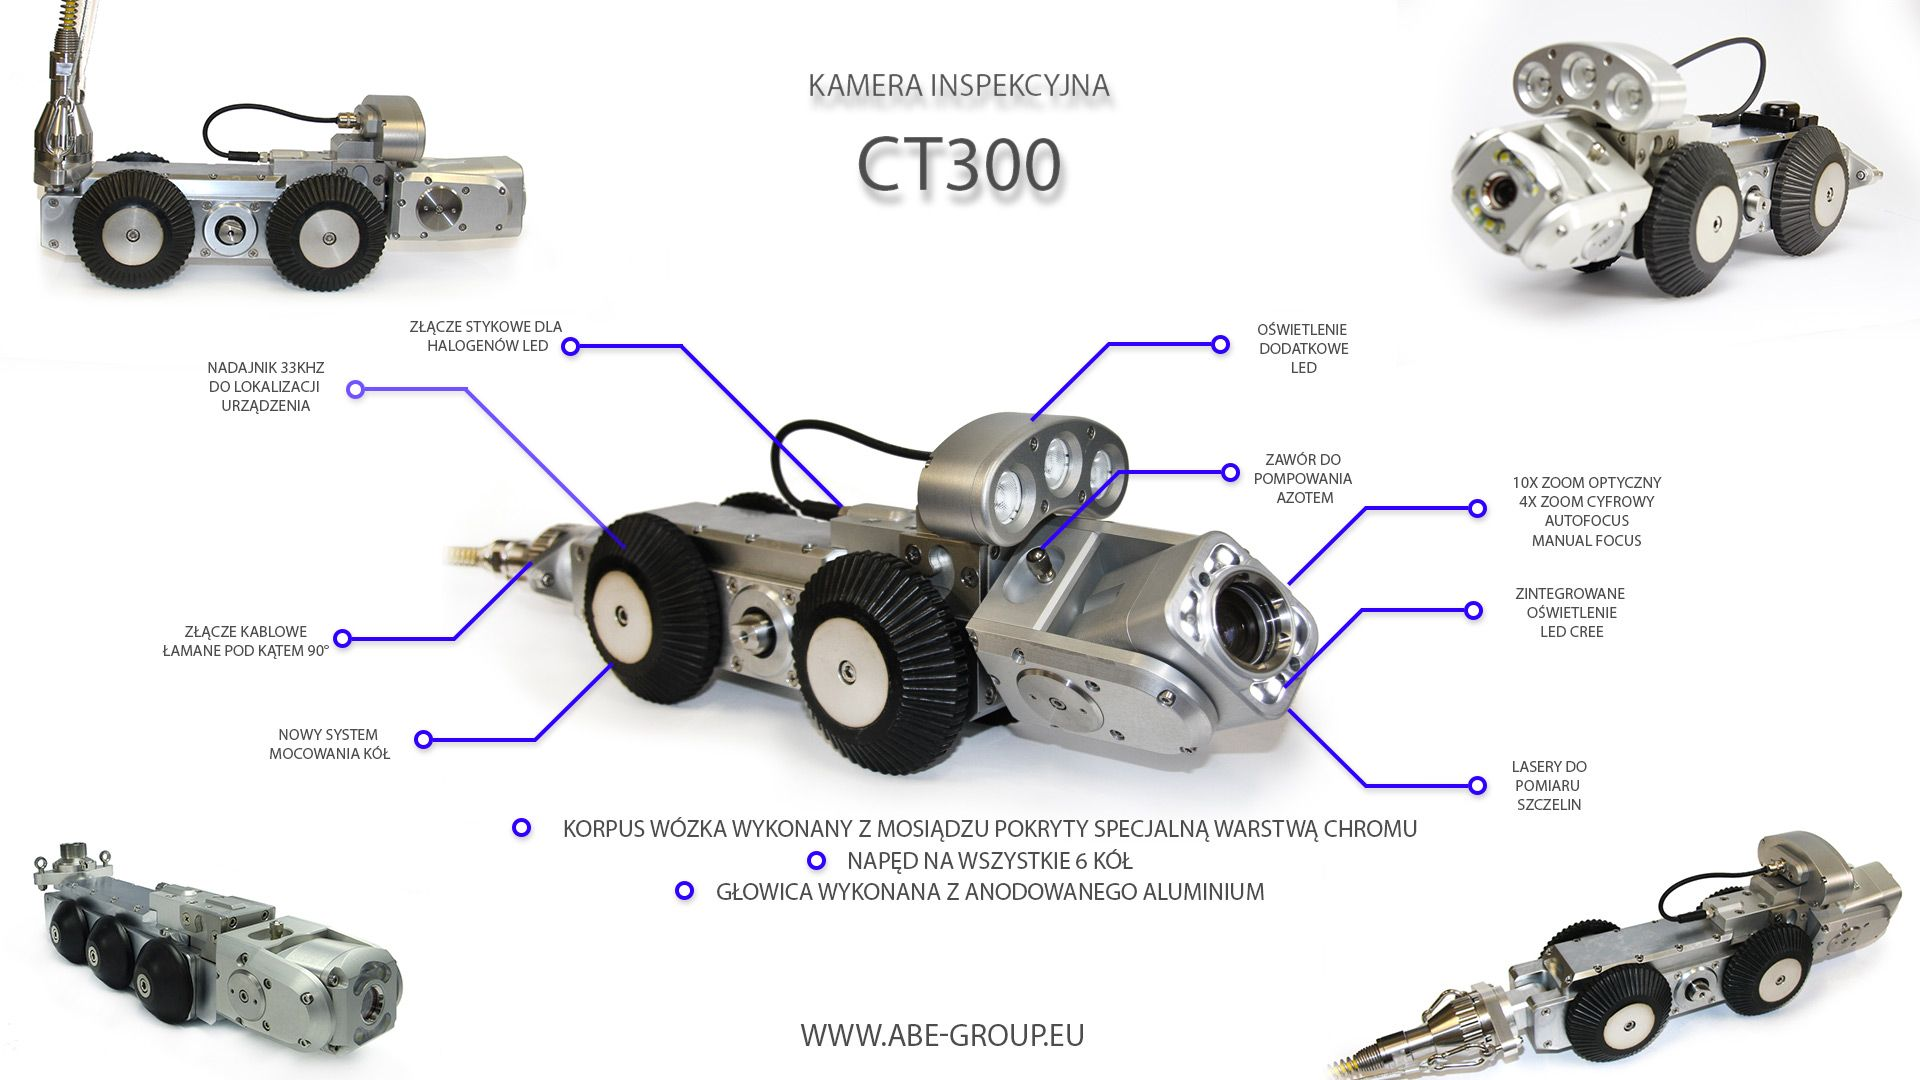 Kamera do inspekcji tv kanalizacji CT300